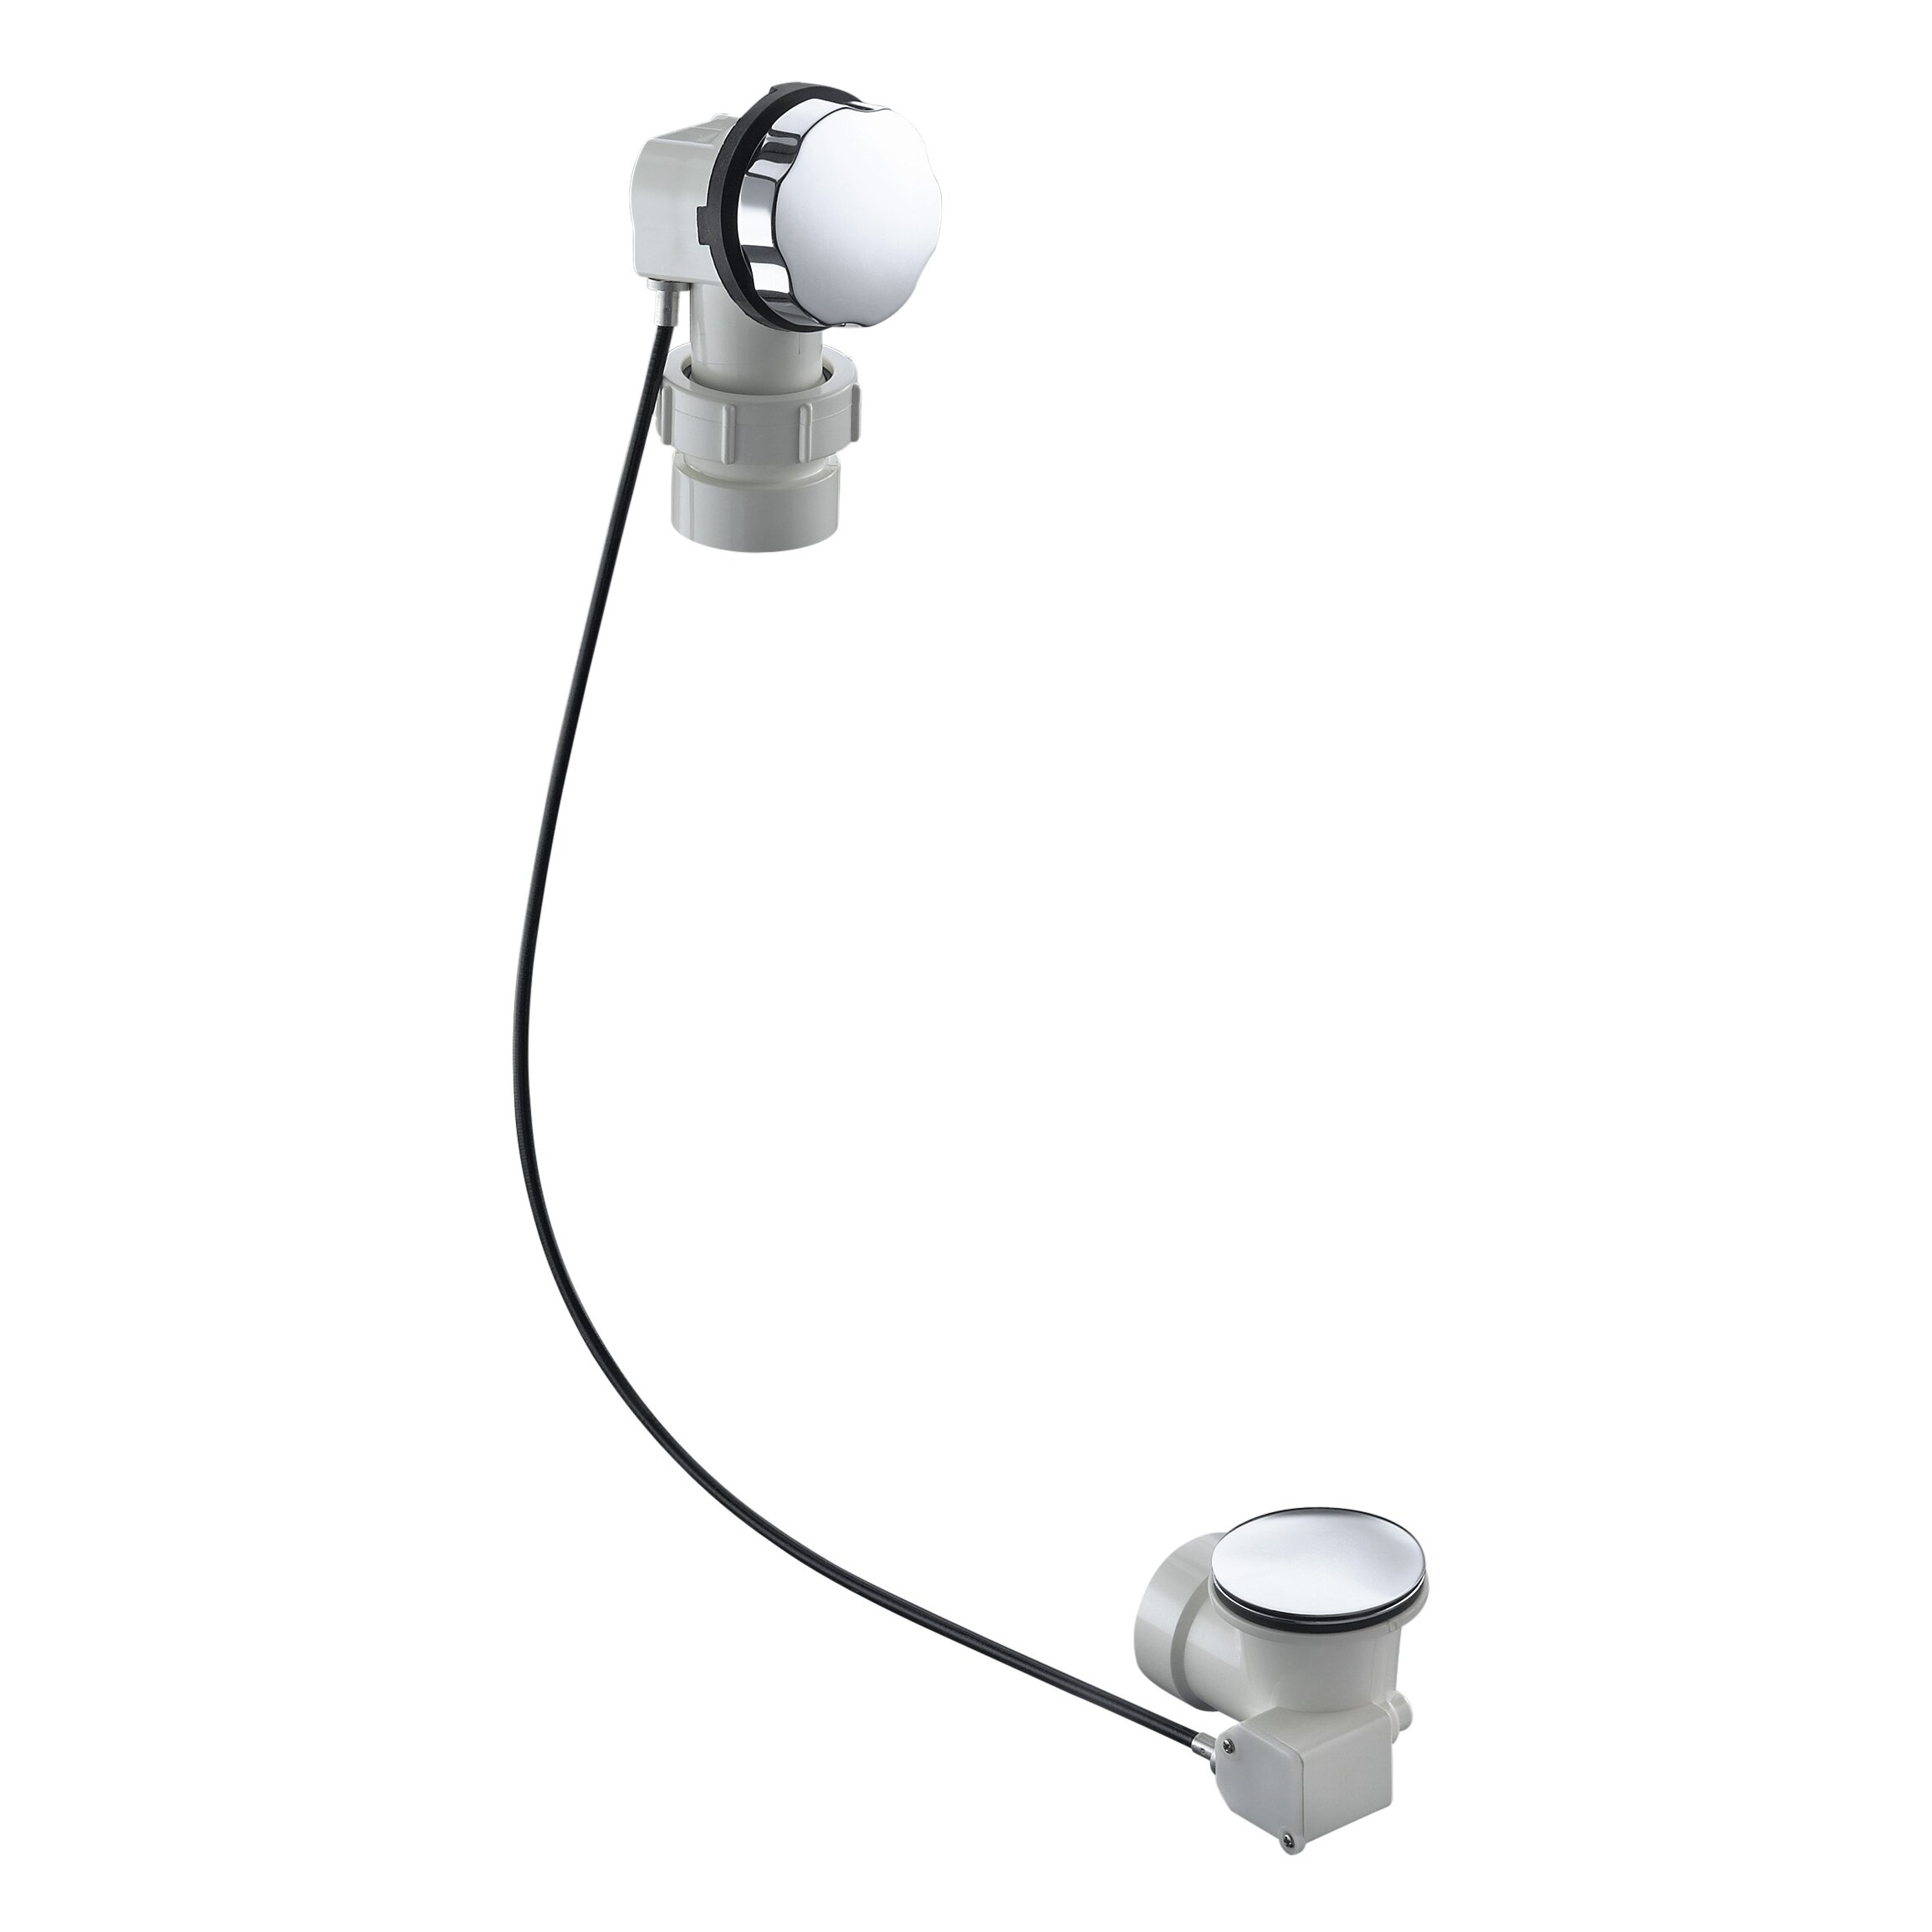 Kohler Bathroom Sink Drain : Kohler Clearflocable 3